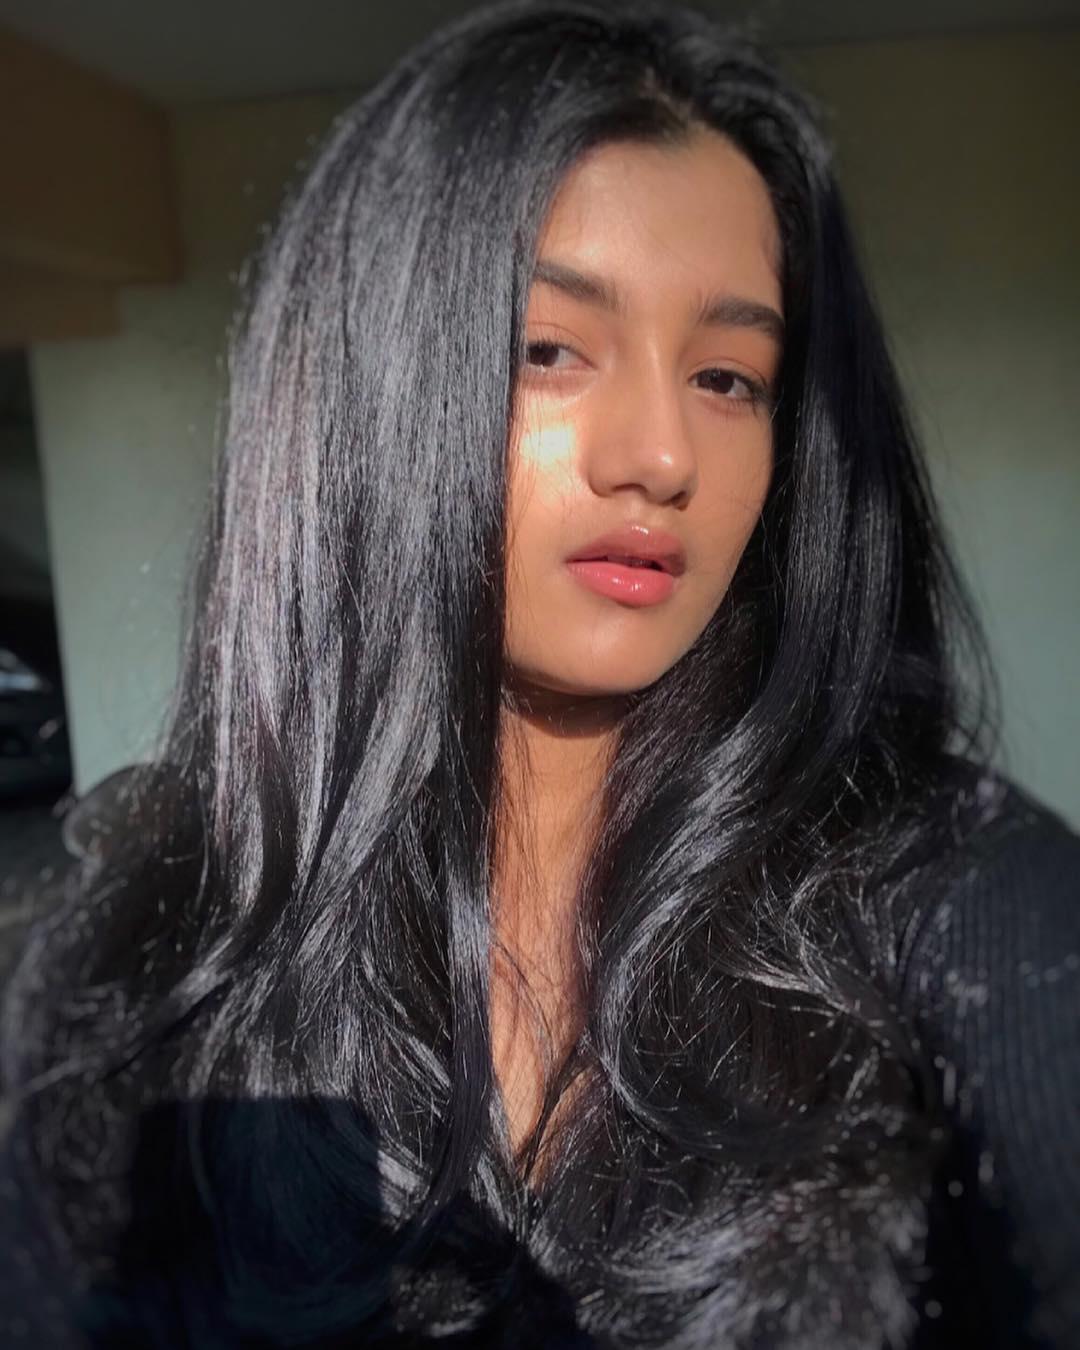 ashlesha thaakur latest selfie photo